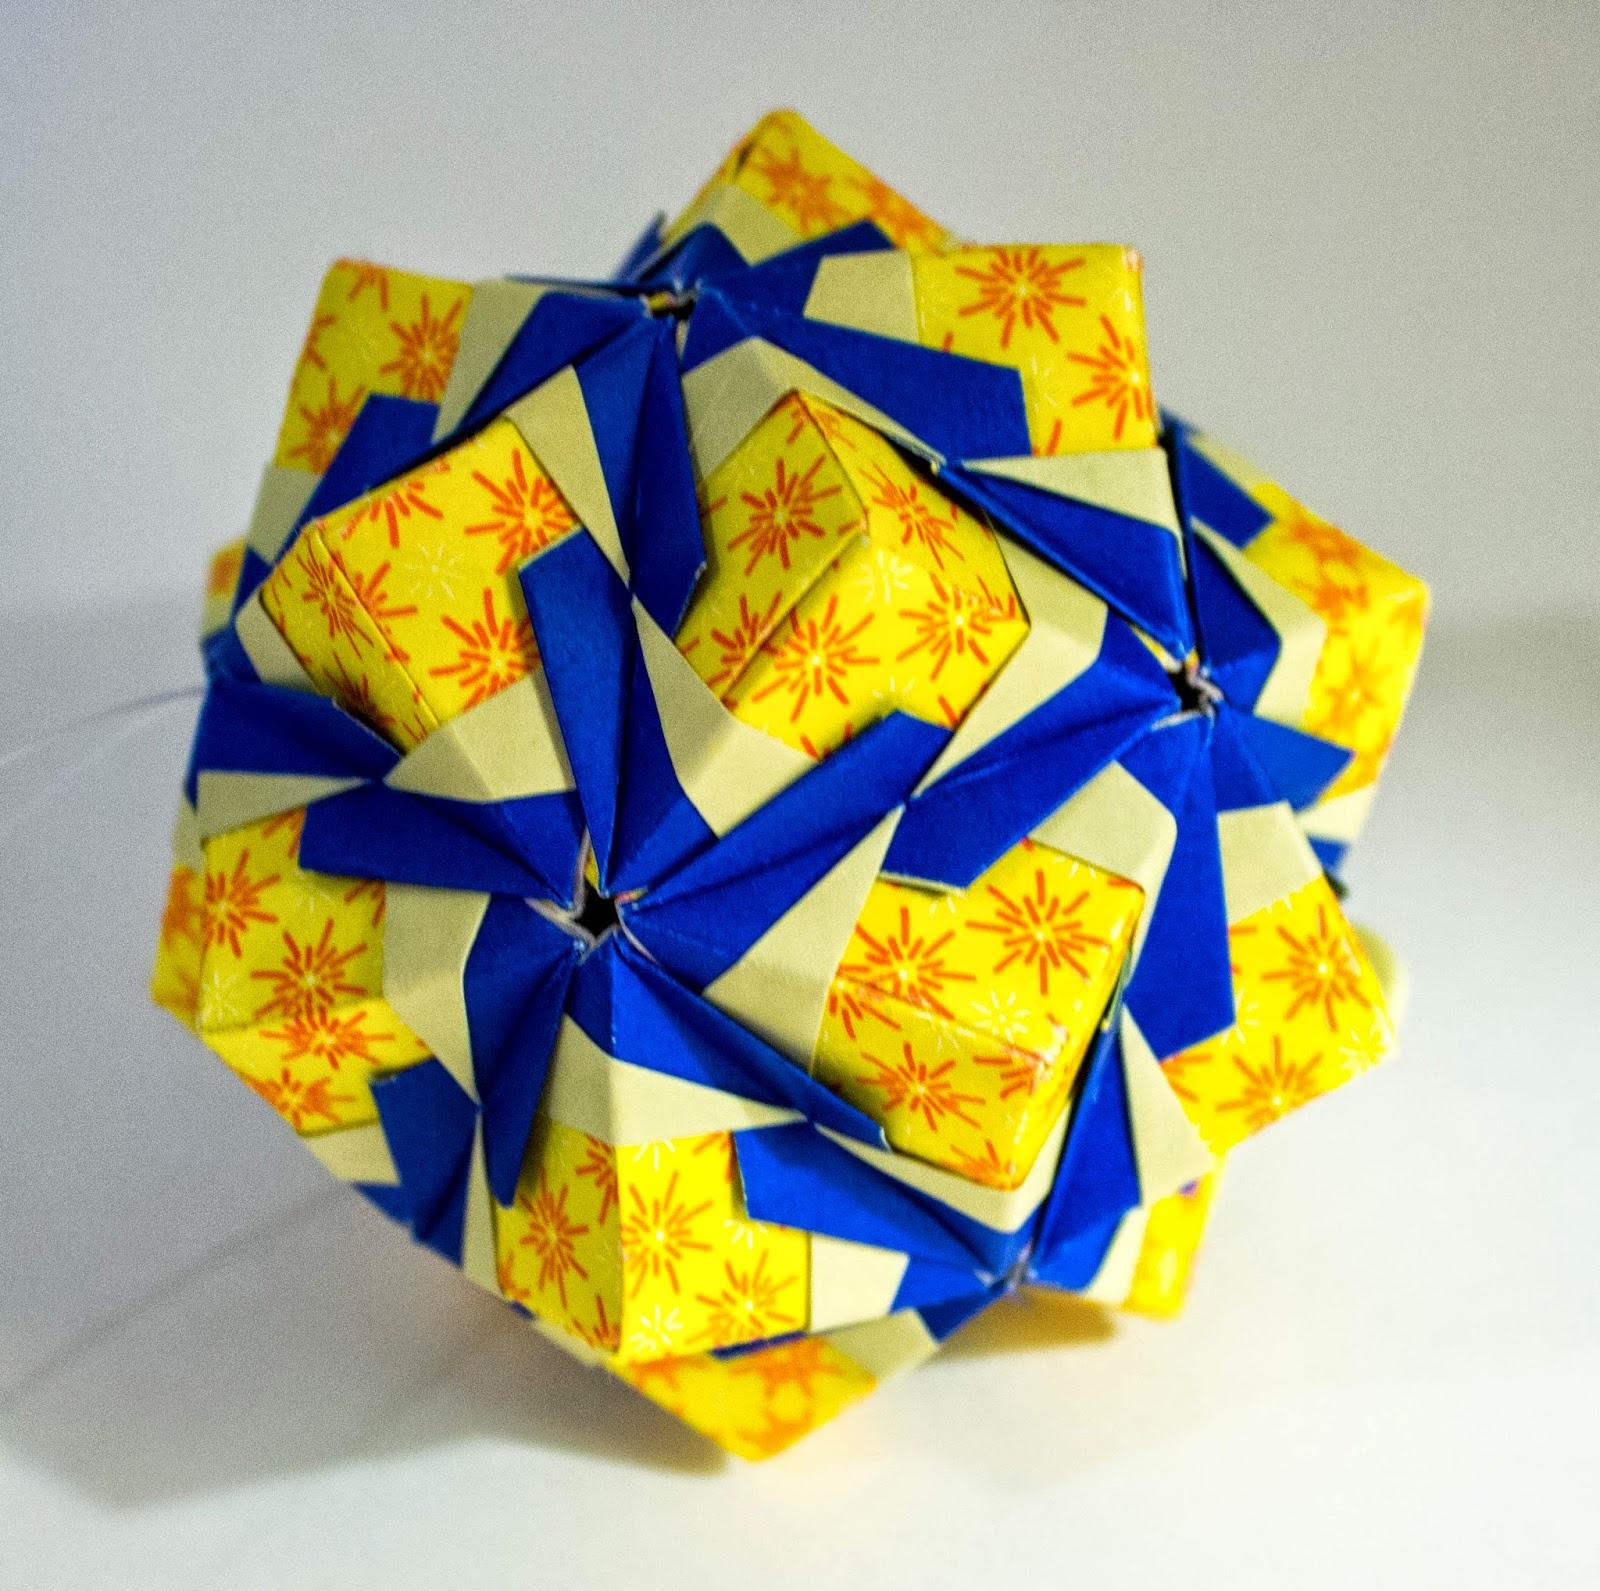 medium resolution of floral origami globes tomoko fuse pdf download